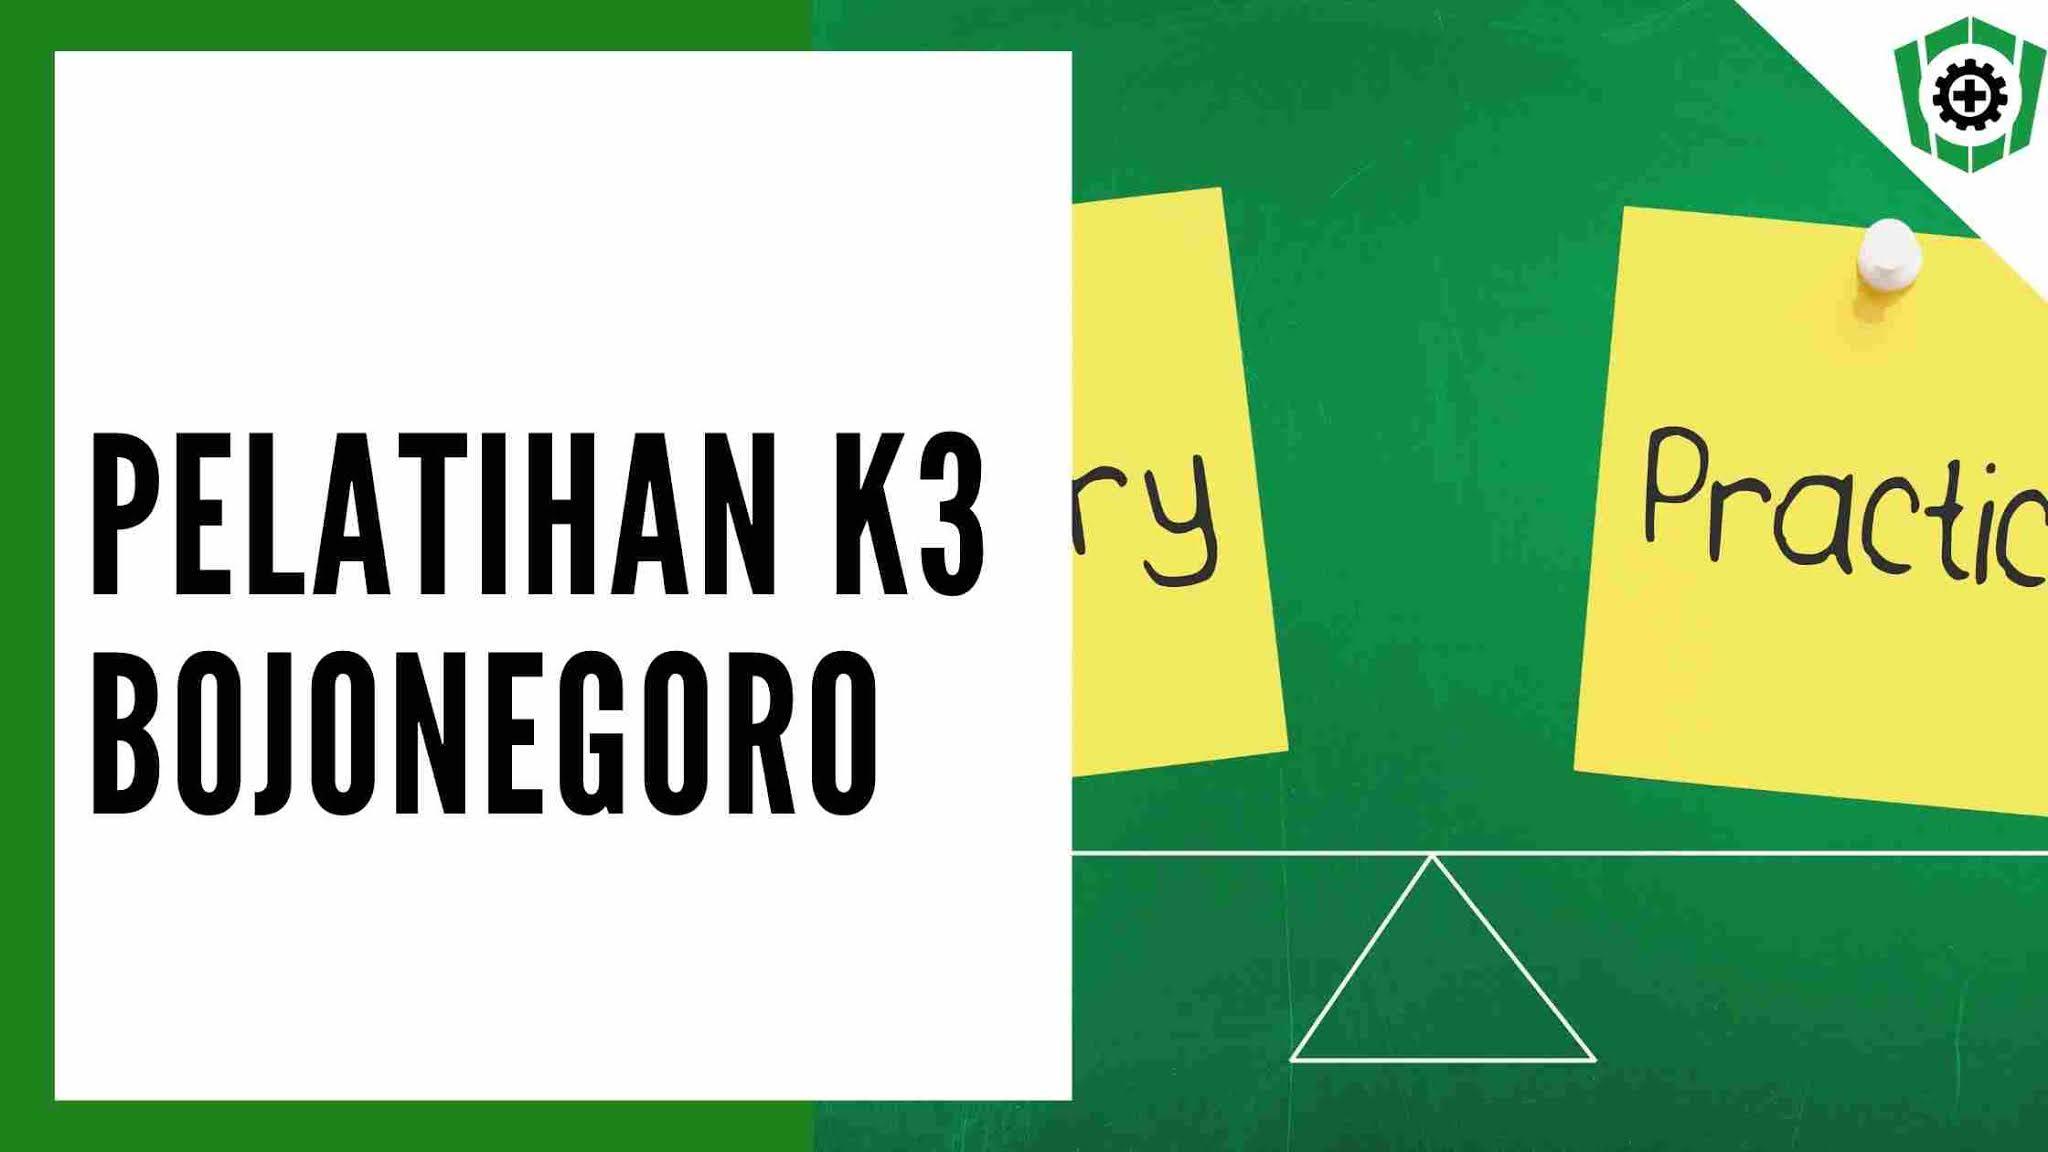 Pelatihan K3 di Bojonegoro